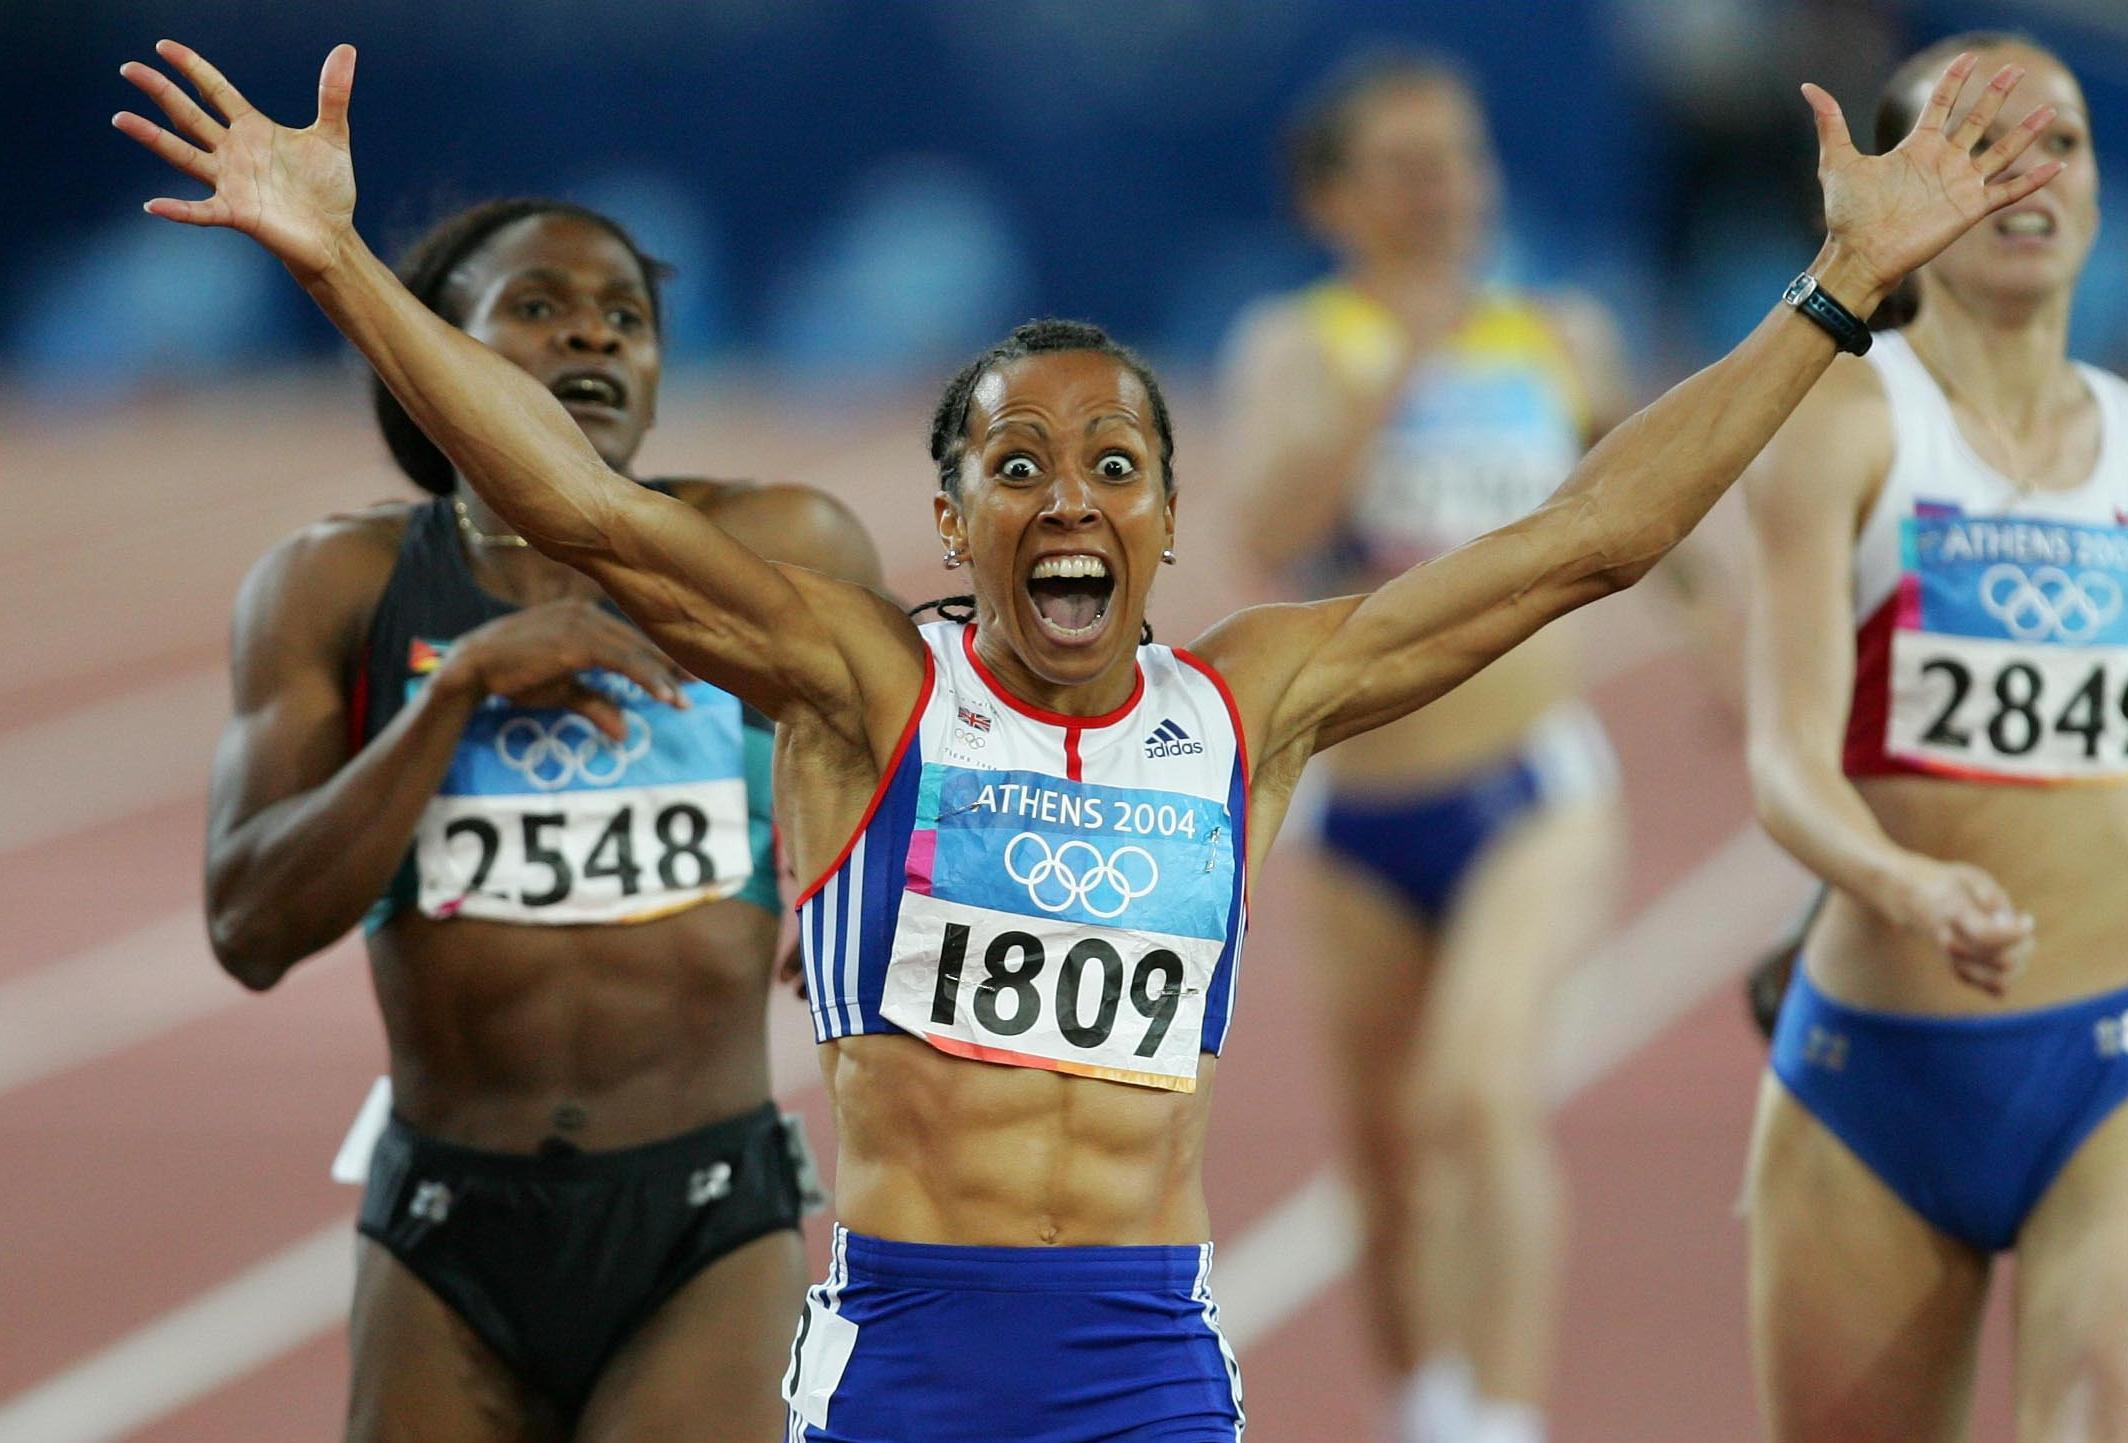 Buy a classic sport photograph: Kelly Holmes' eye-popping celebration